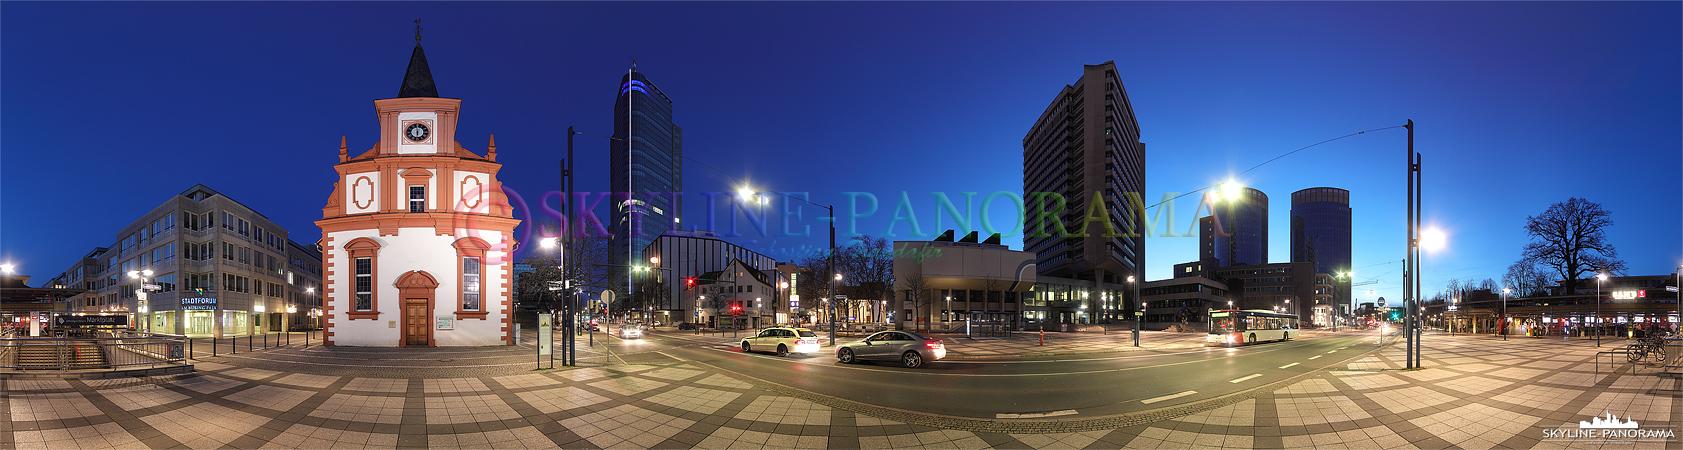 Panorama Offenbach am Main